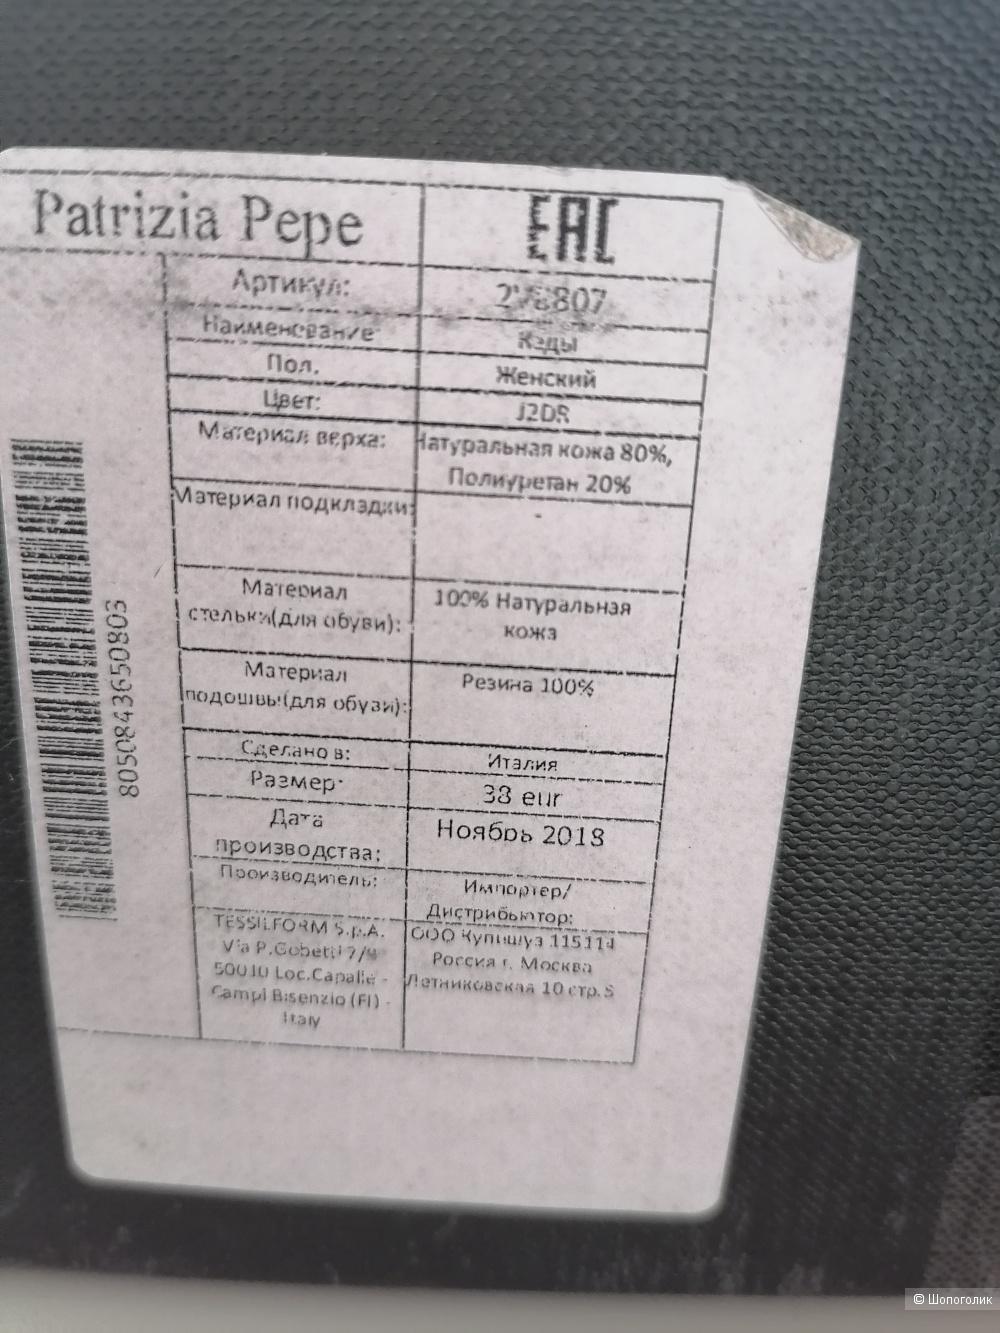 Кеды Patrizia pepe. 38р